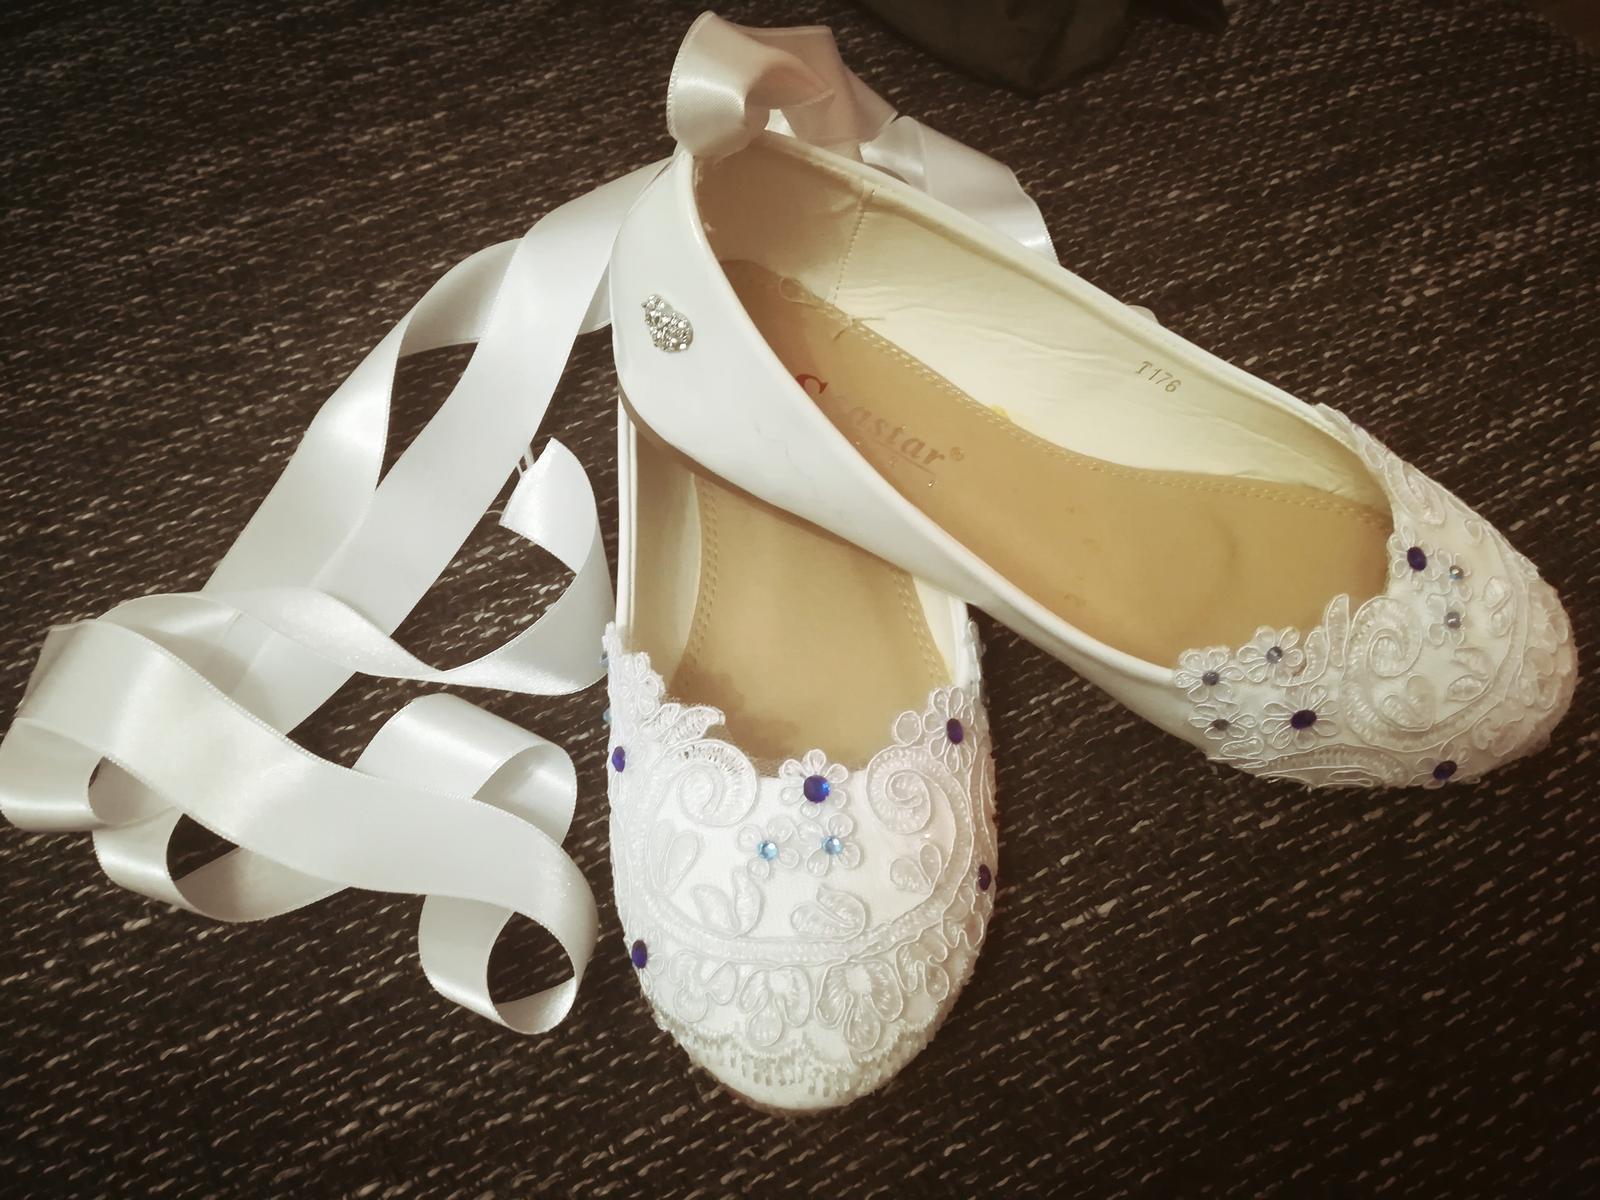 Moja handmade svadba - Obrázok č. 1